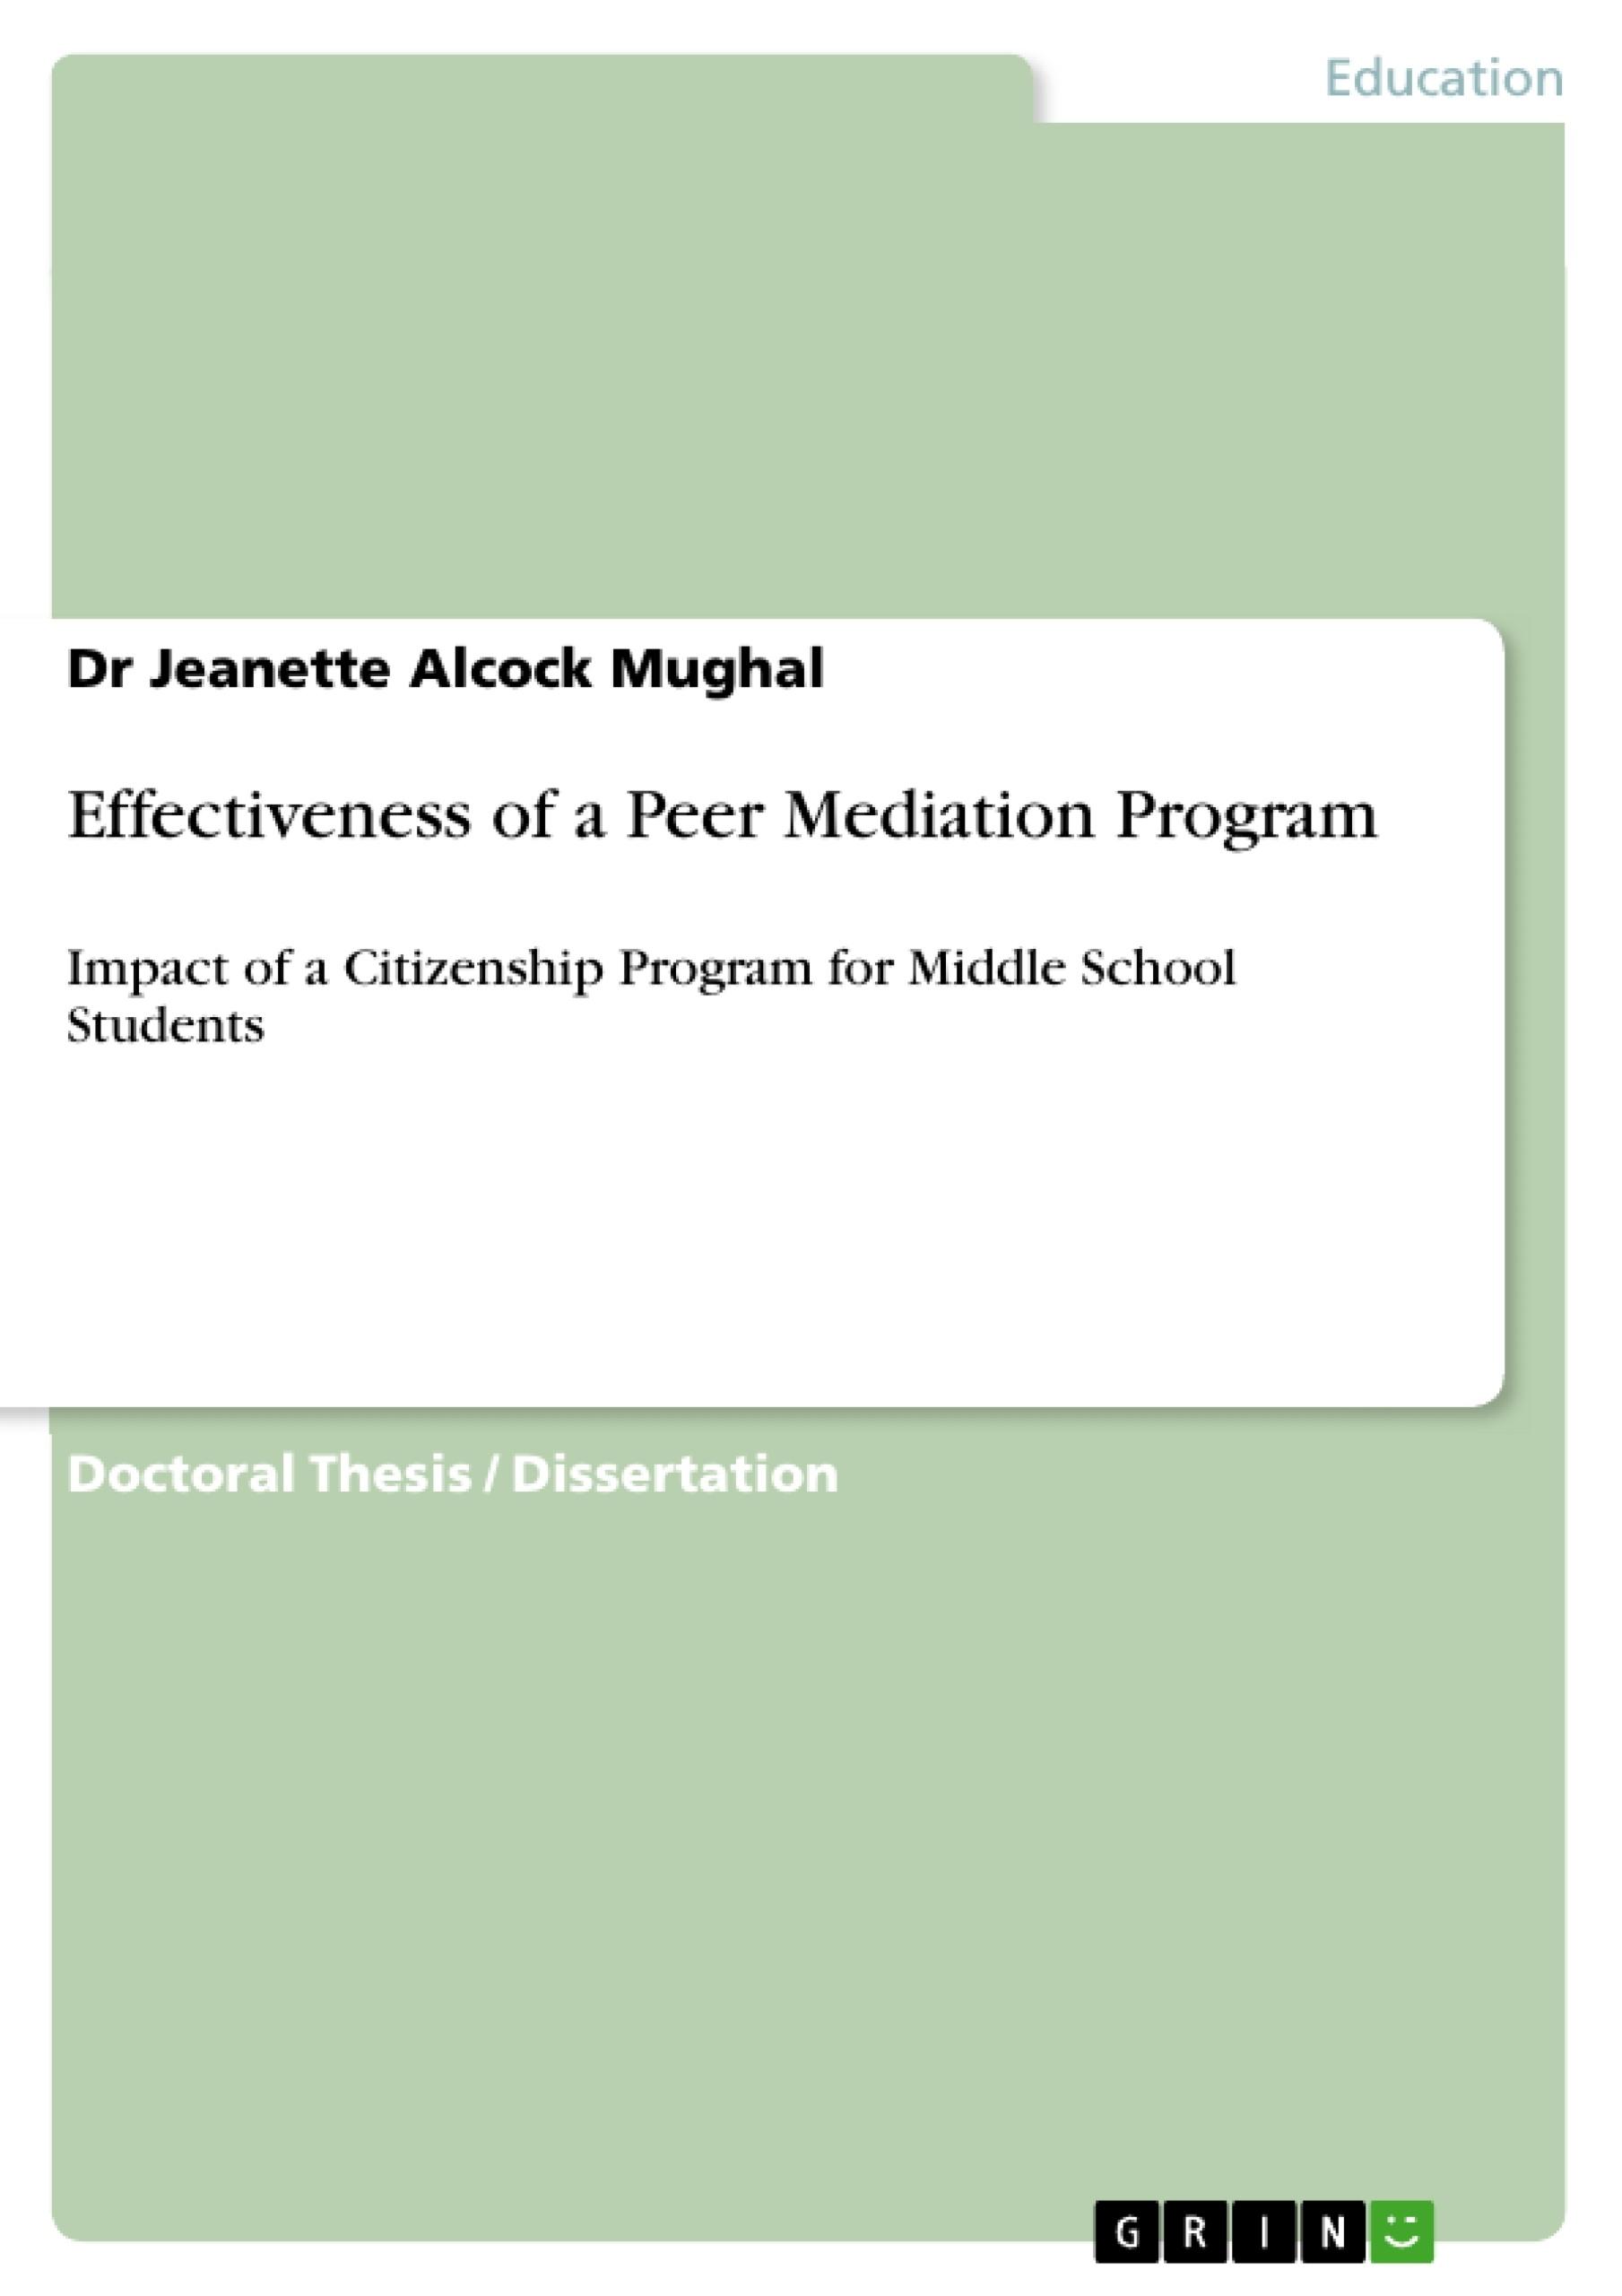 Title: Effectiveness of a Peer Mediation Program